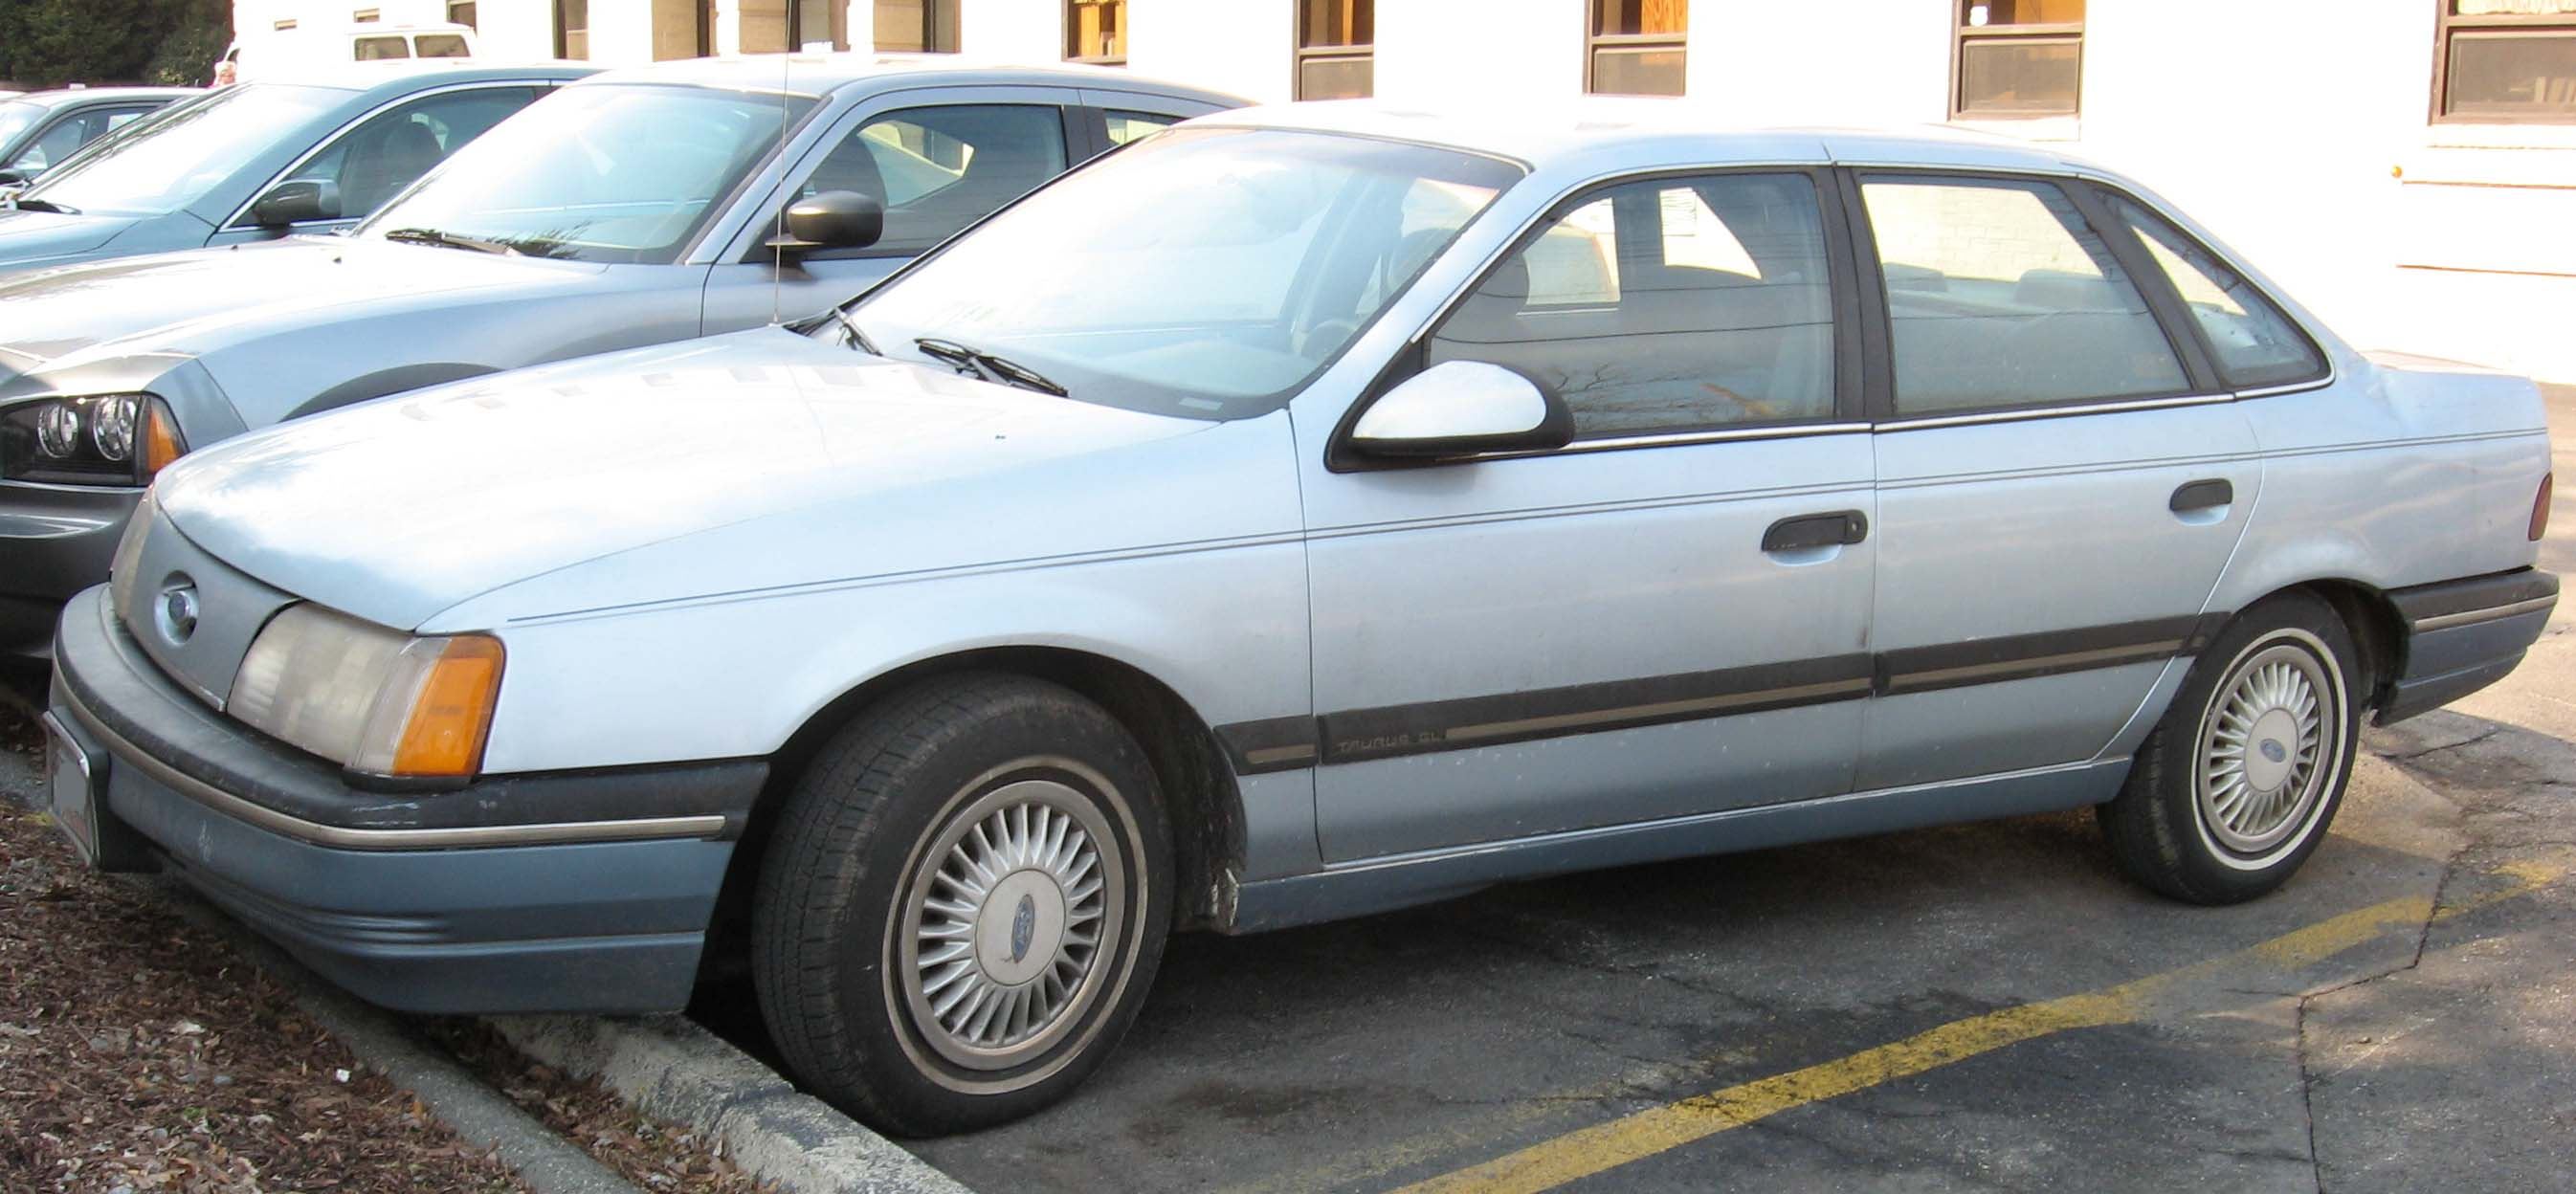 Ford Taurus 1982